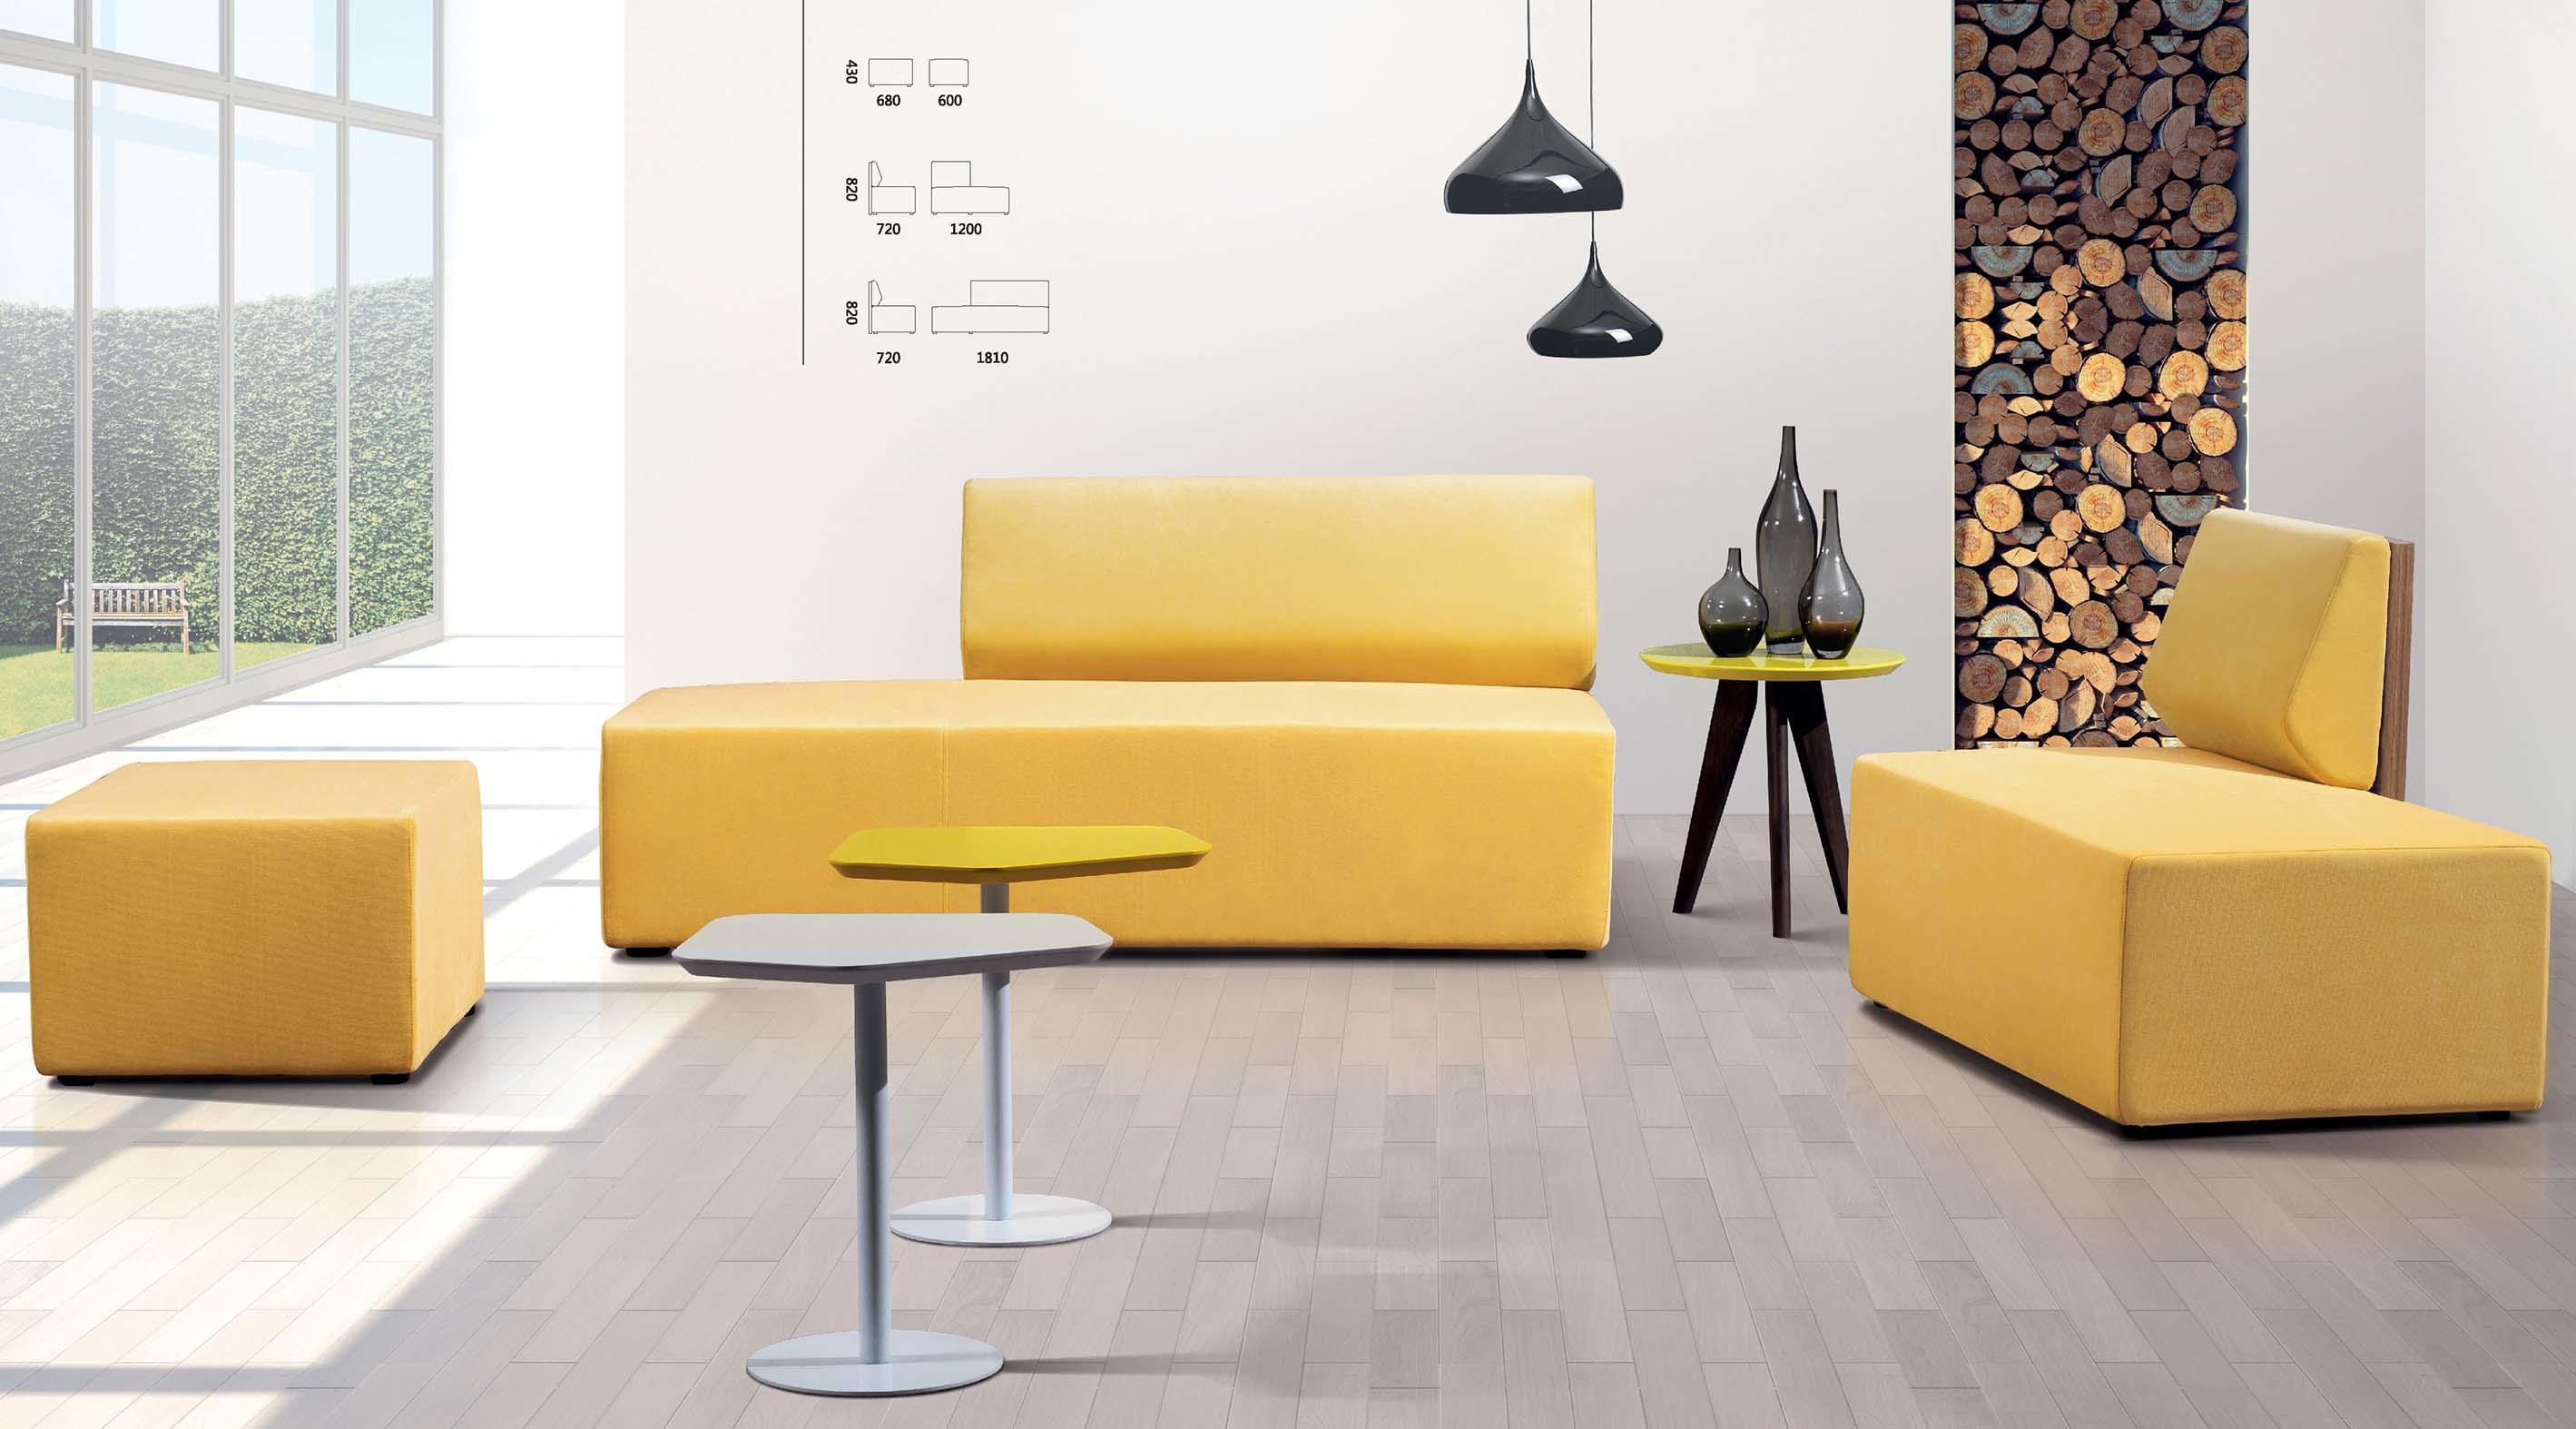 Chinamuebles modernos sala de espera sof de oficina con for Proveedores de muebles de oficina